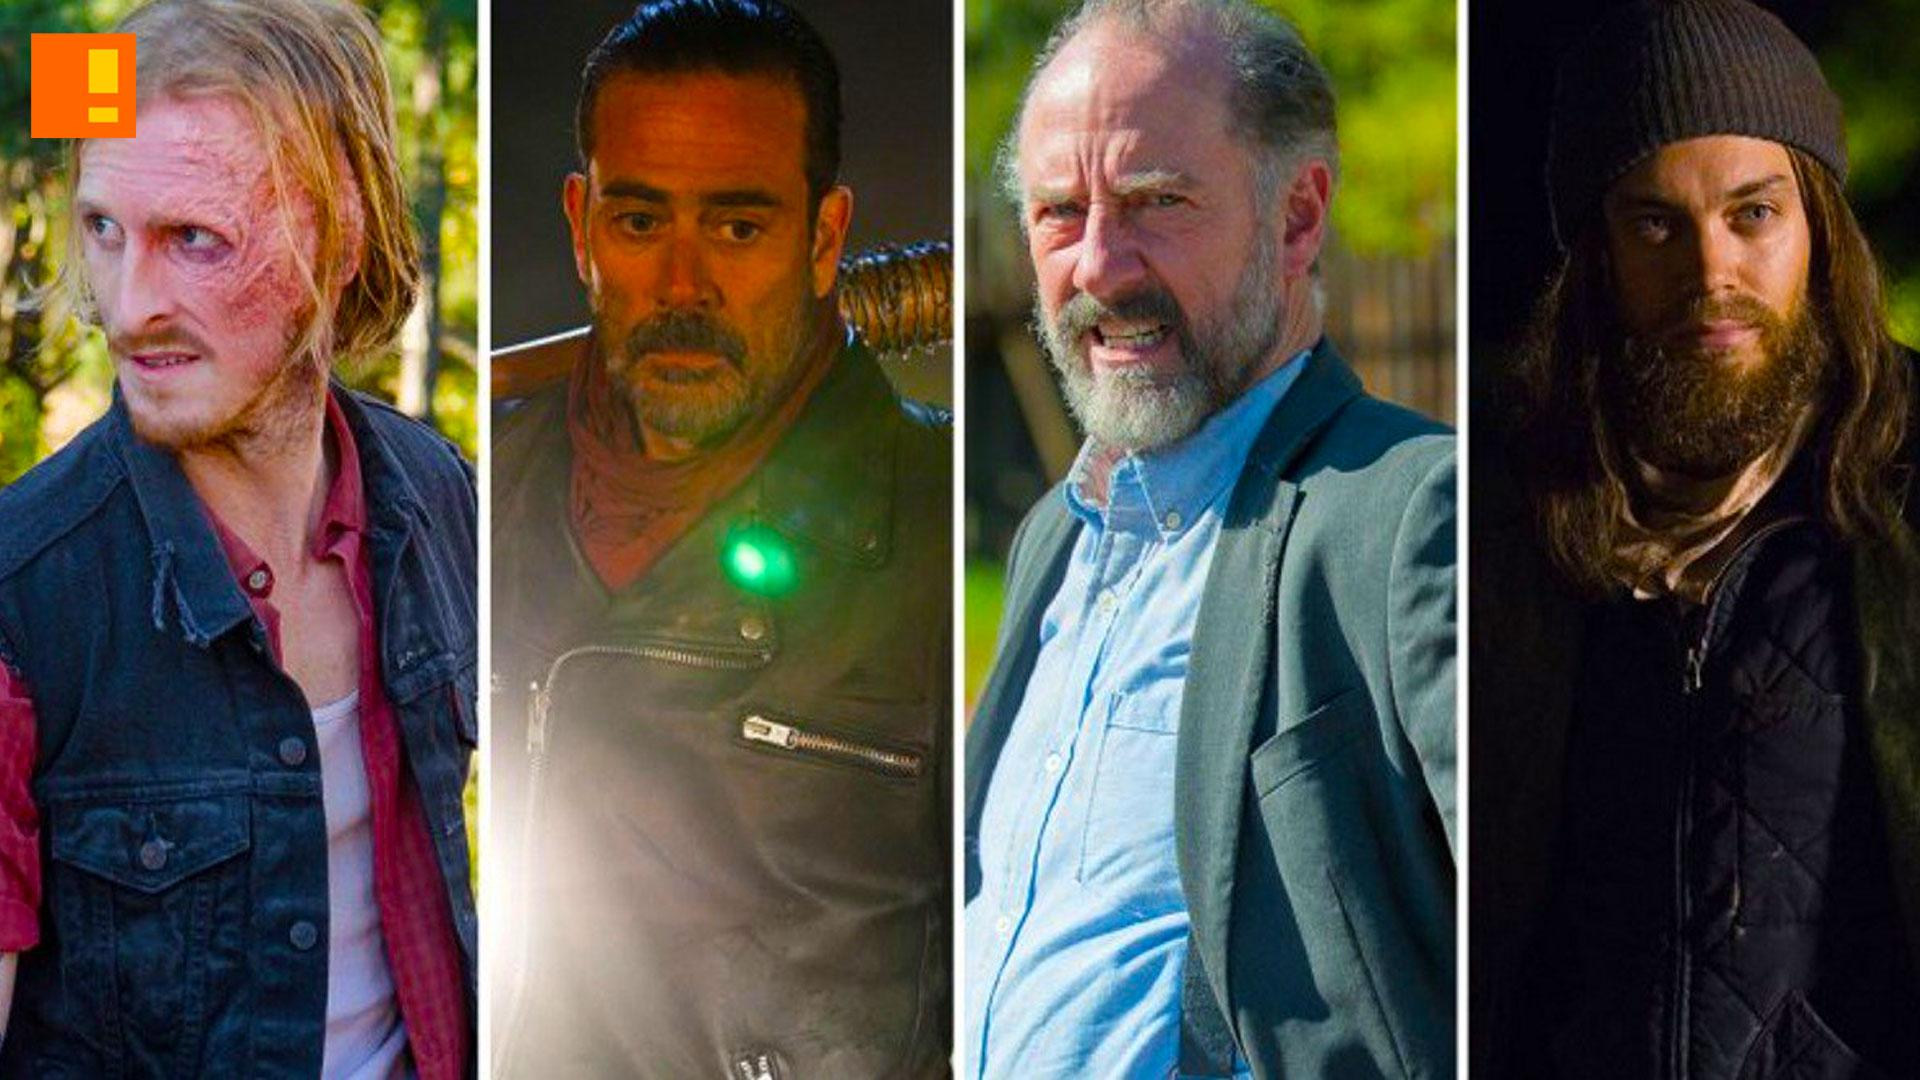 the walking dead, season 7, actors, morgan, entertainment on tap, the action pixel, @theactionpixel